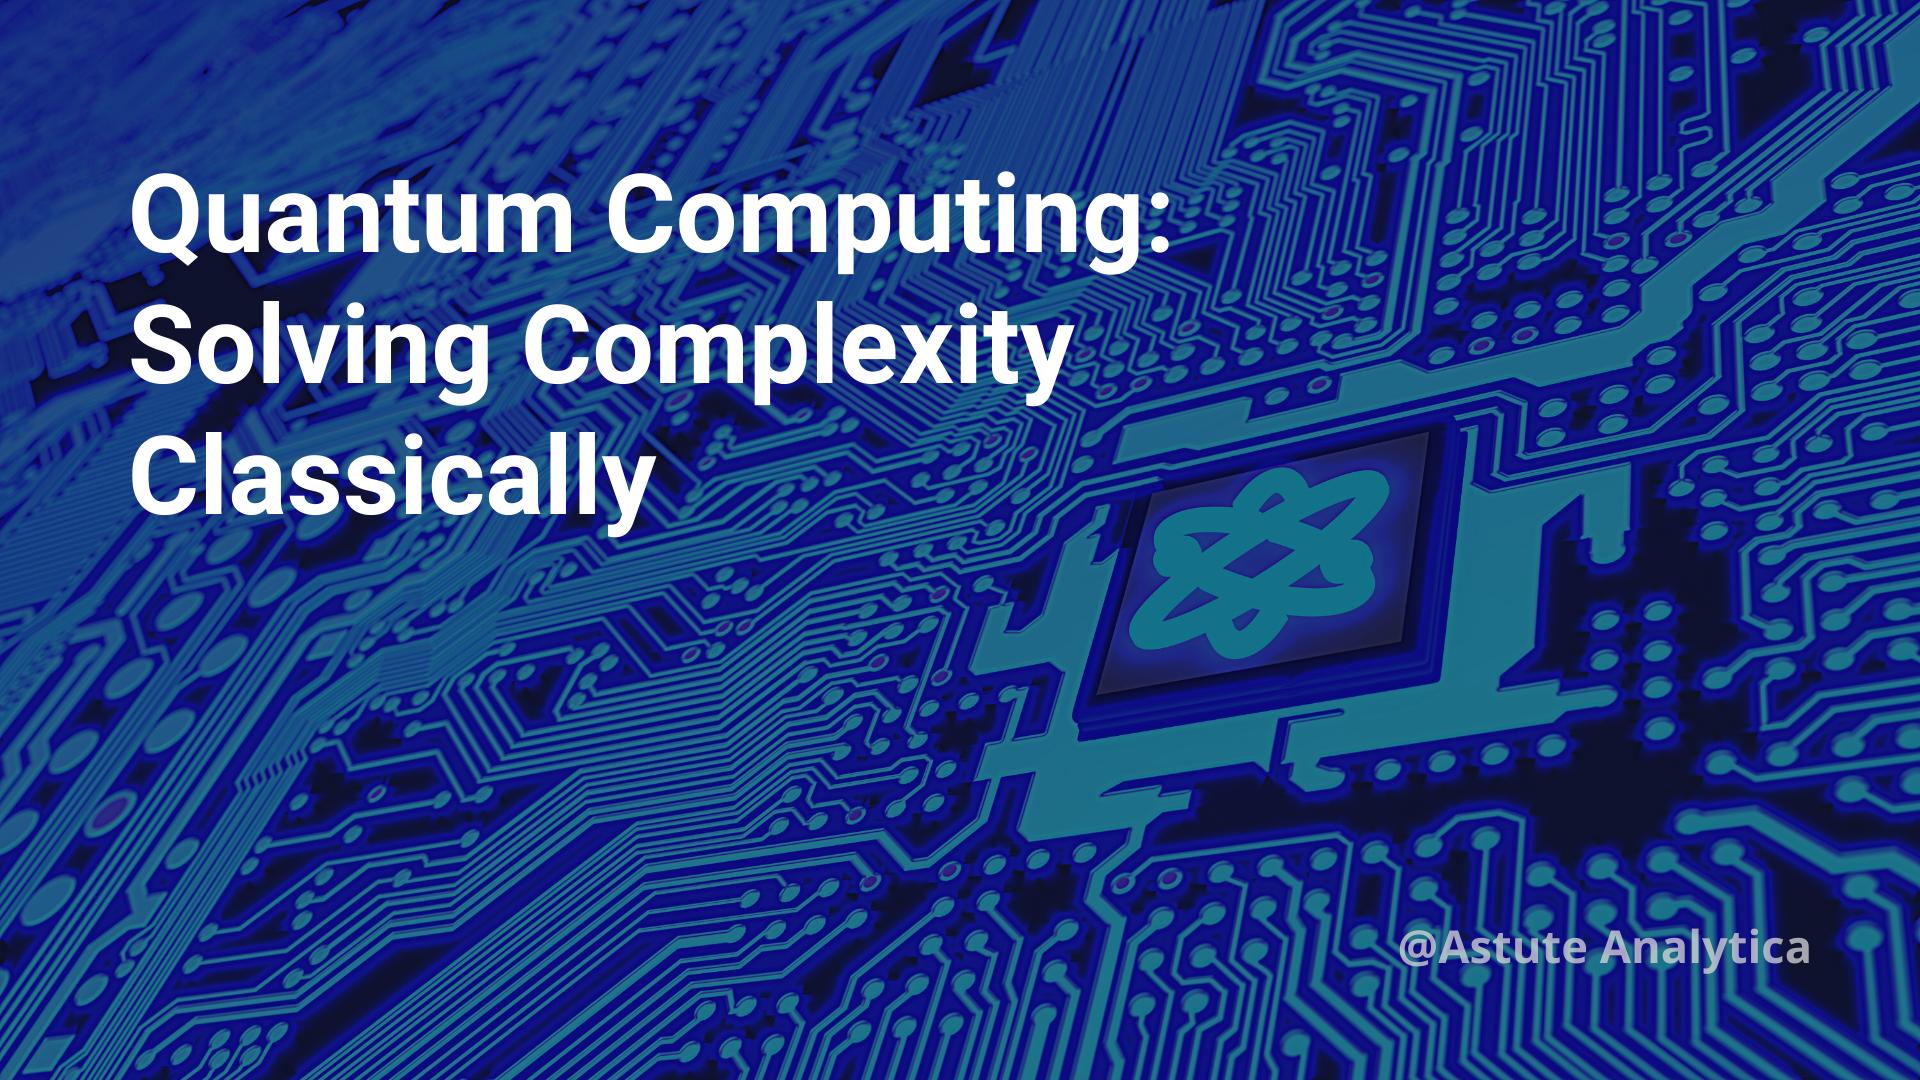 Quantum Computing Solving Complexity Classically